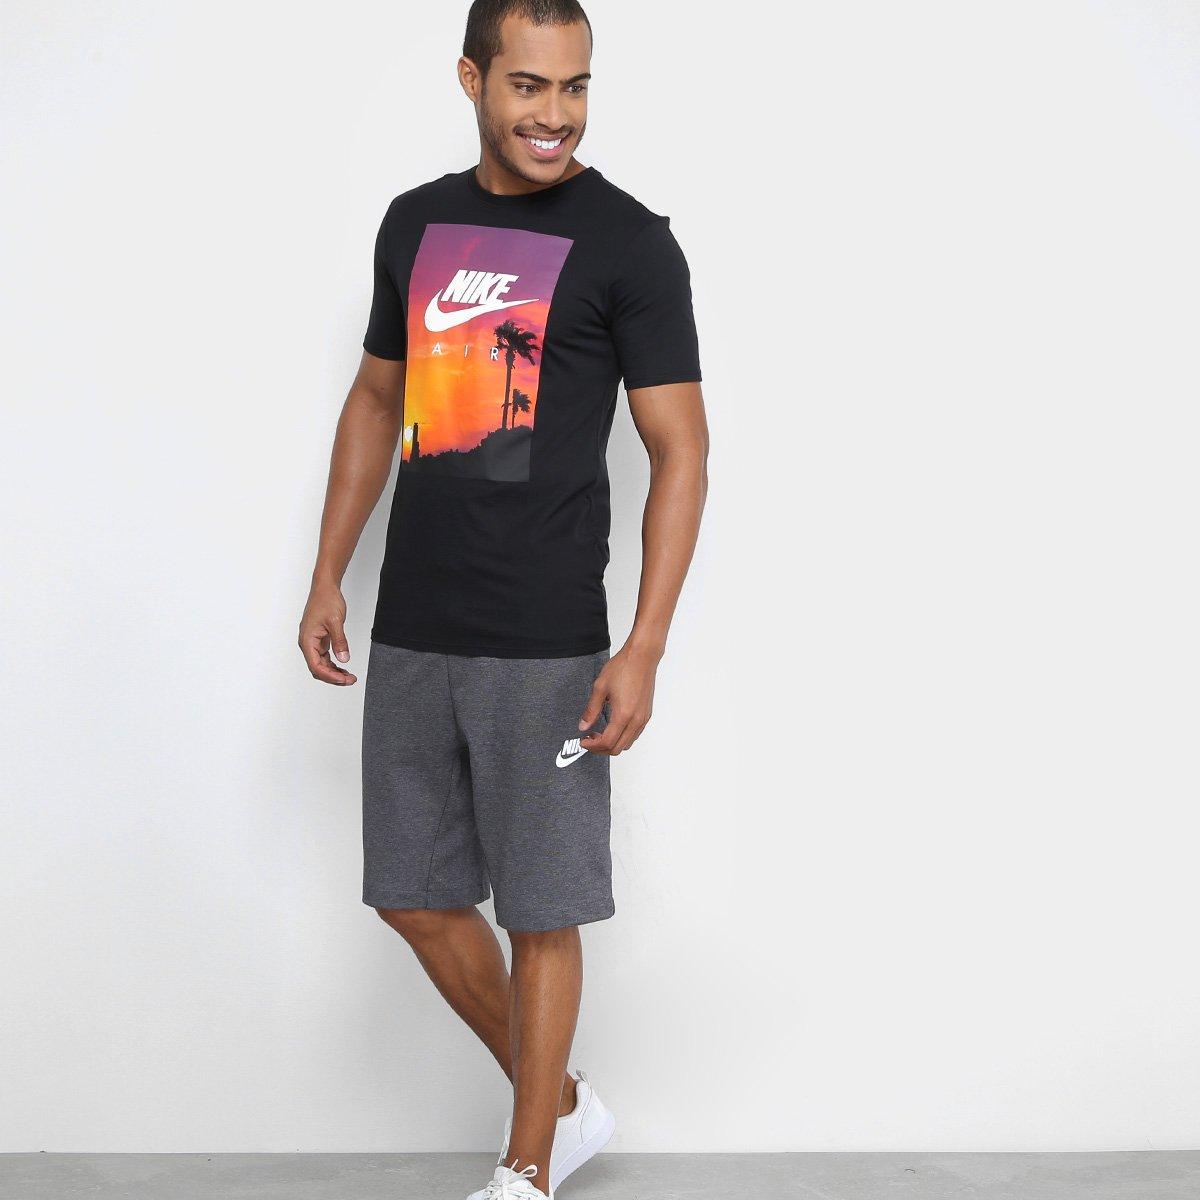 e595dadbcd Camiseta Nike Ftwr 4 Estampada Masculina - Compre Agora